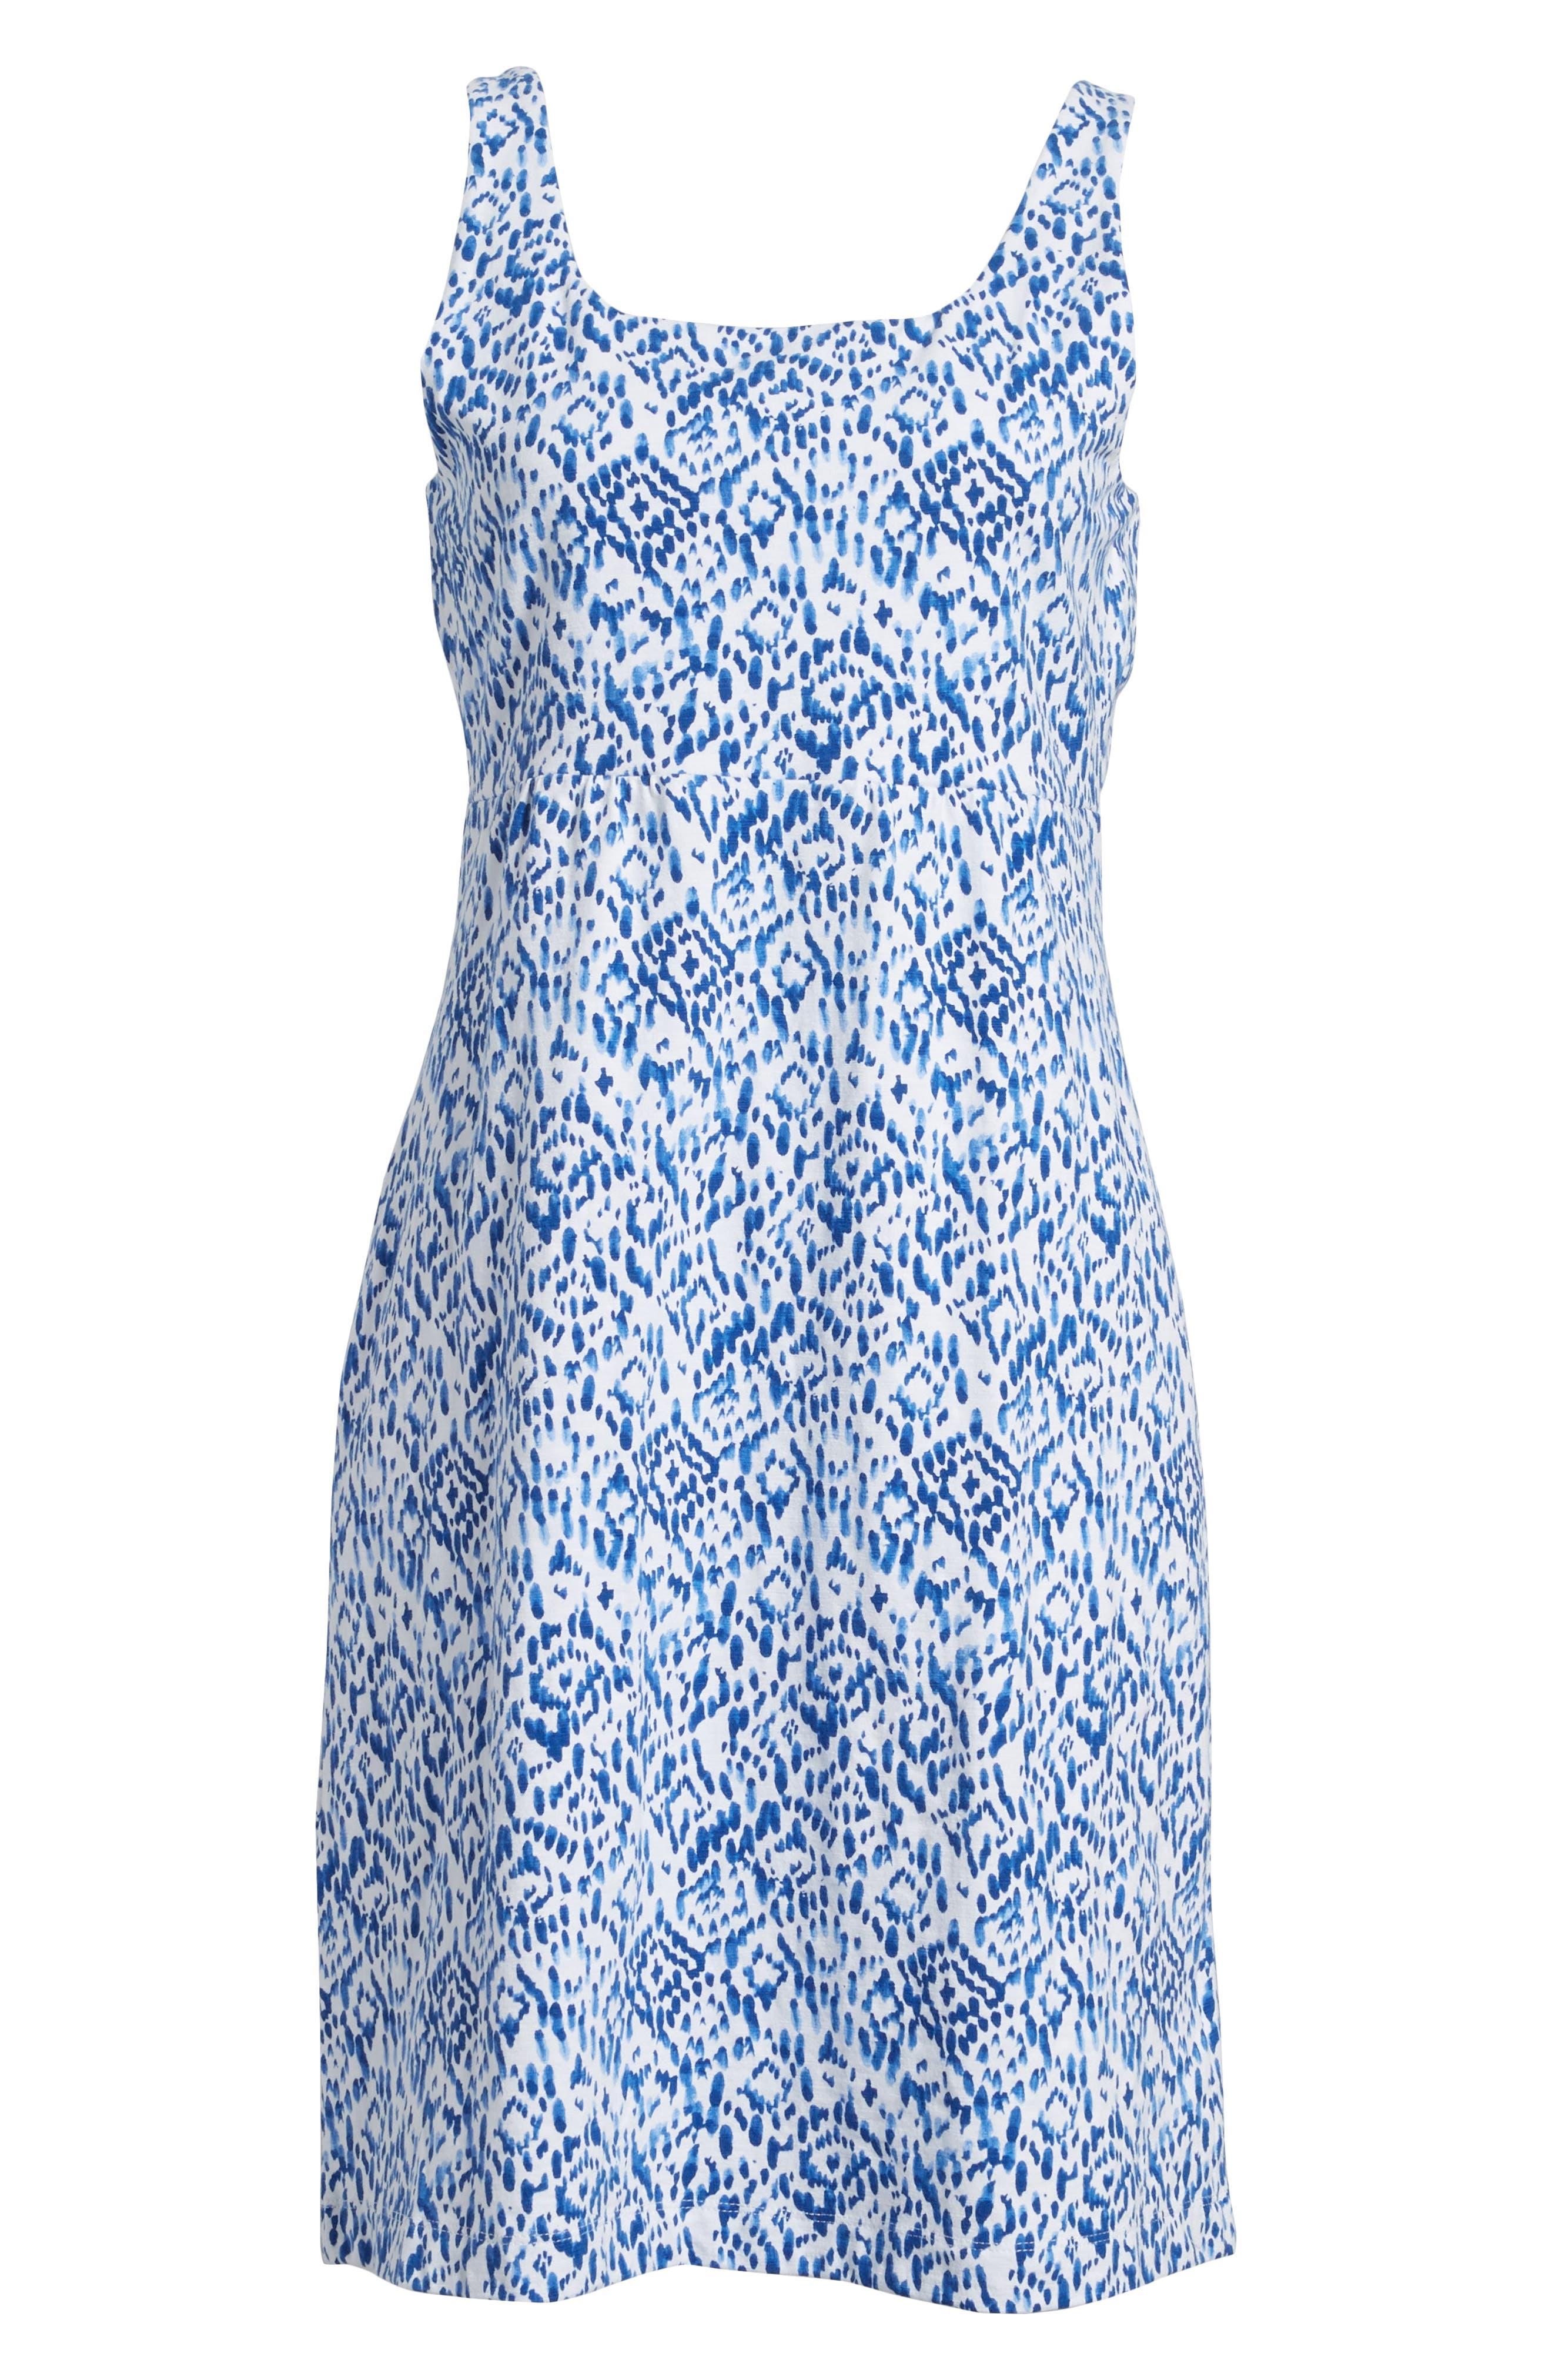 La Liorena Sleeveless Stretch Cotton Tank Dress,                             Alternate thumbnail 6, color,                             400